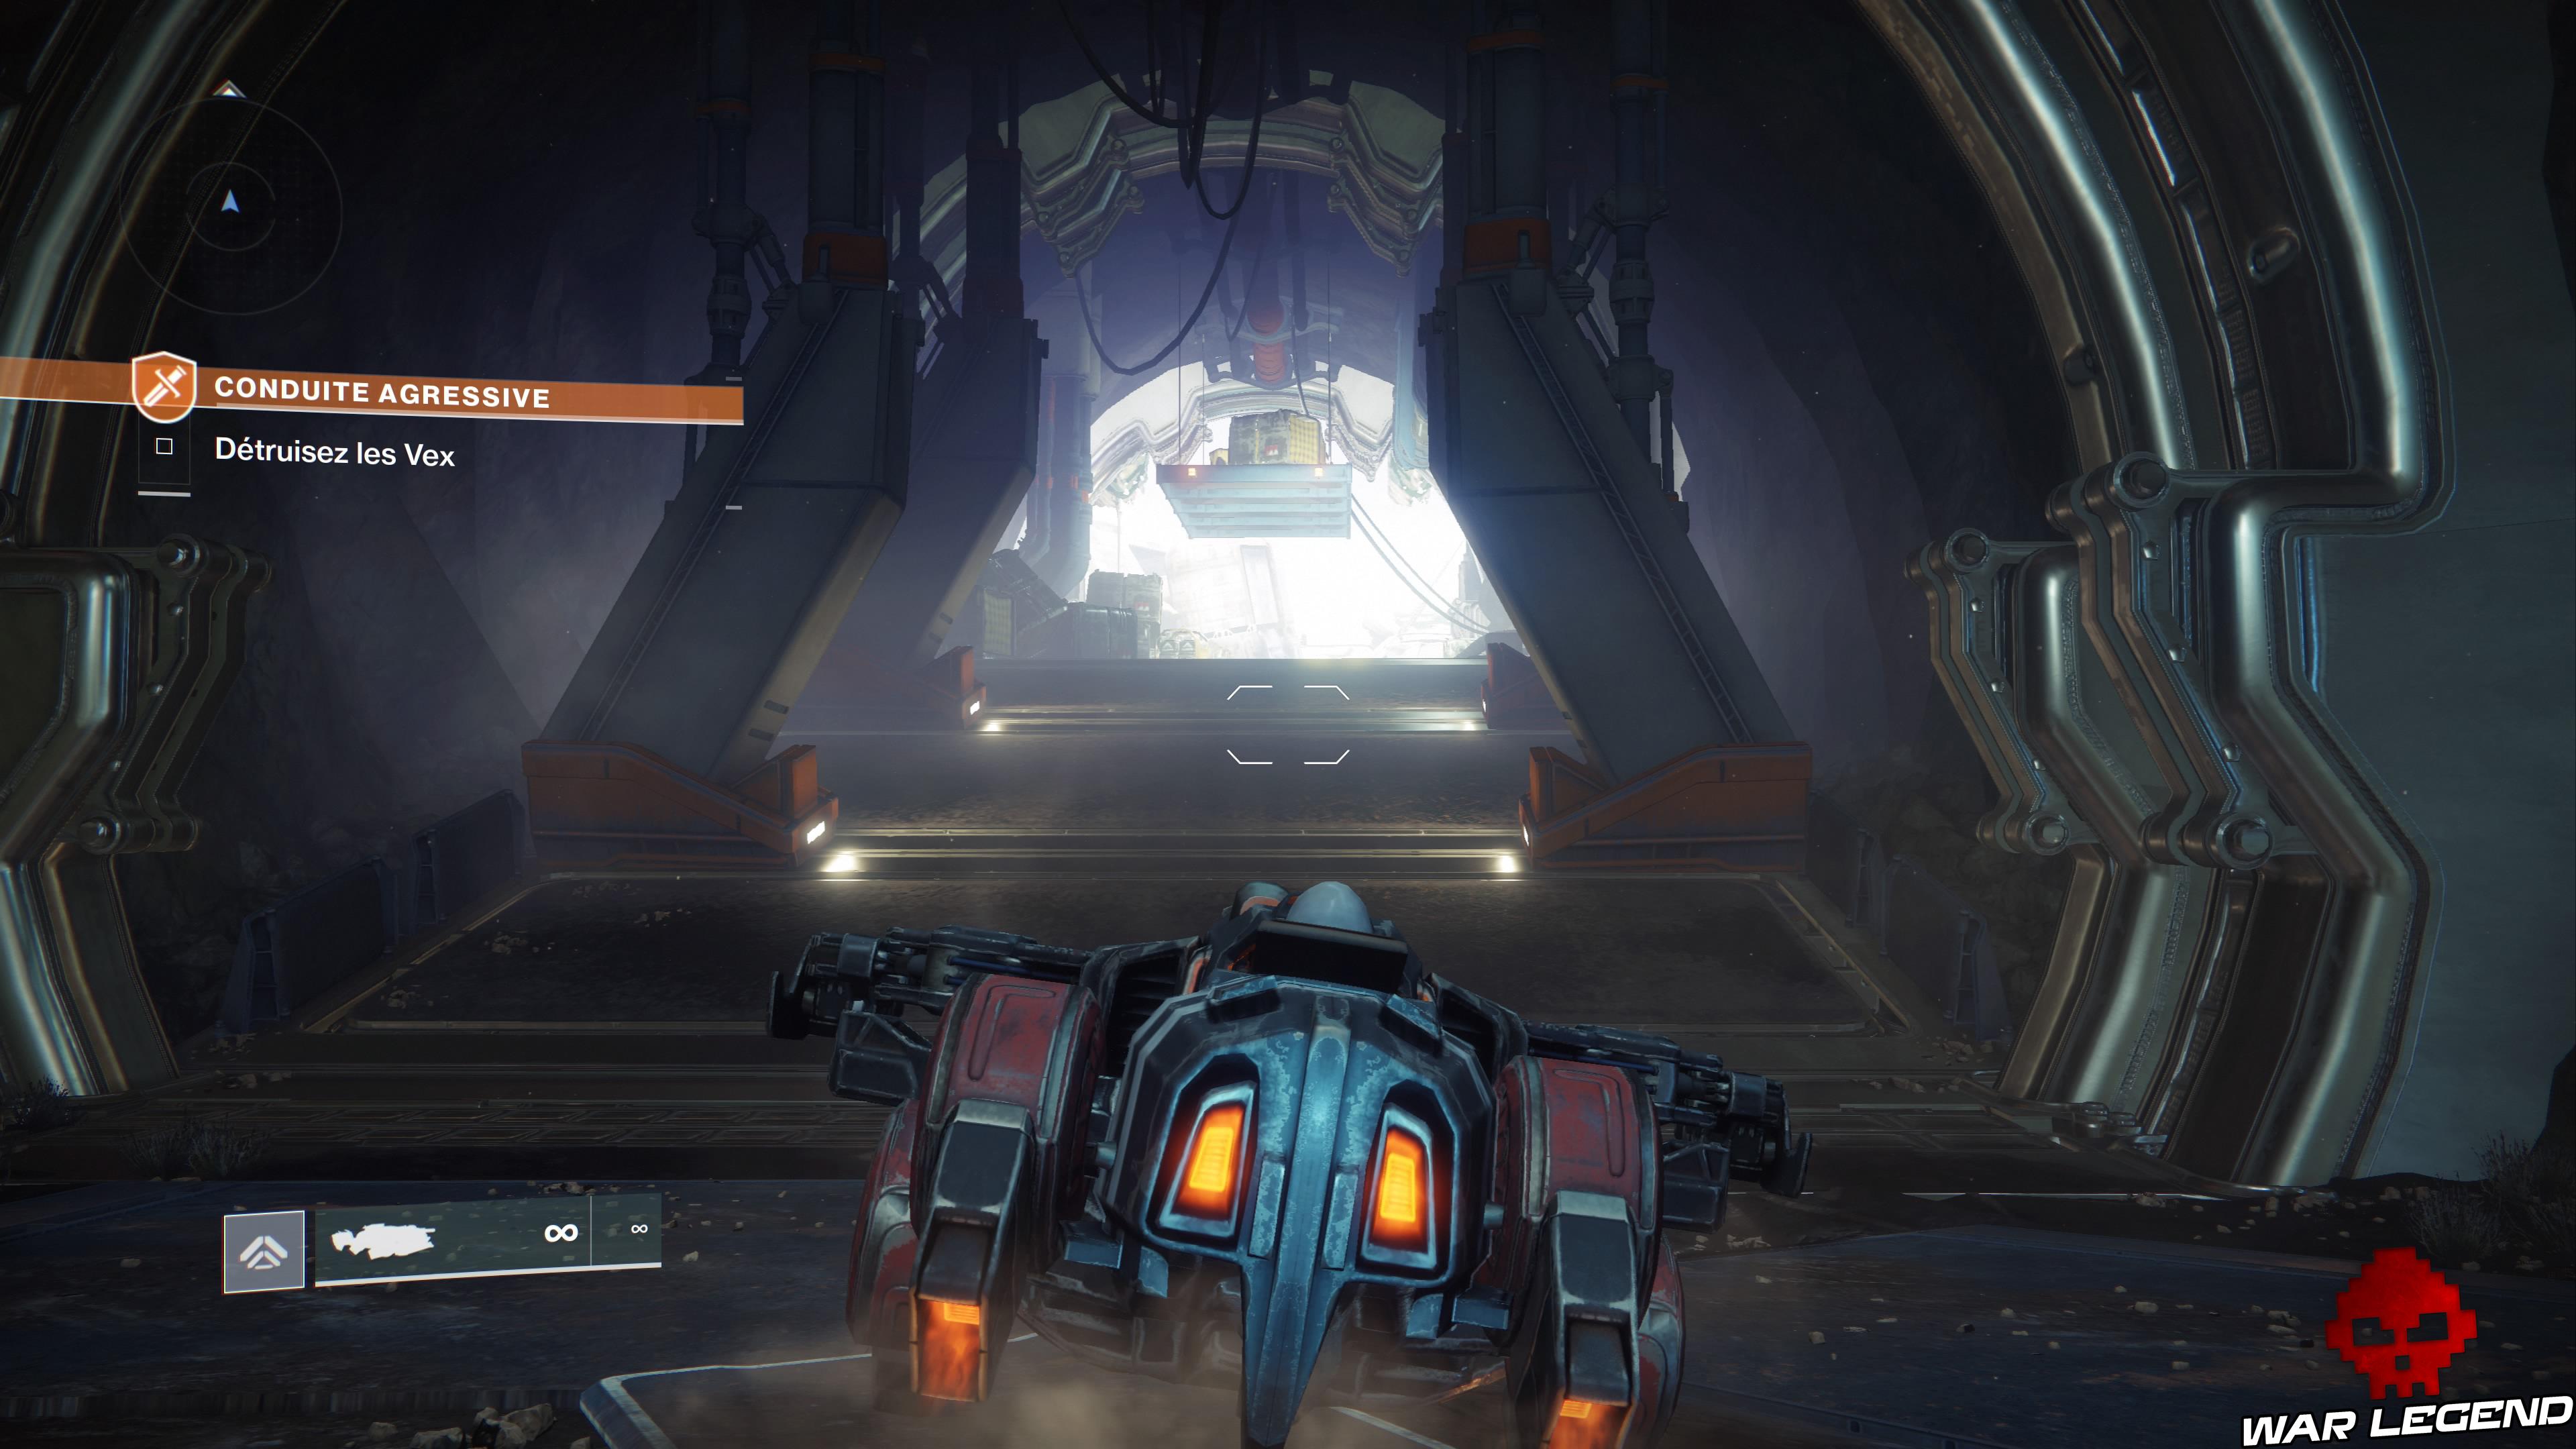 Soluce Destiny 2 - Conduite Agressive (Aventure)